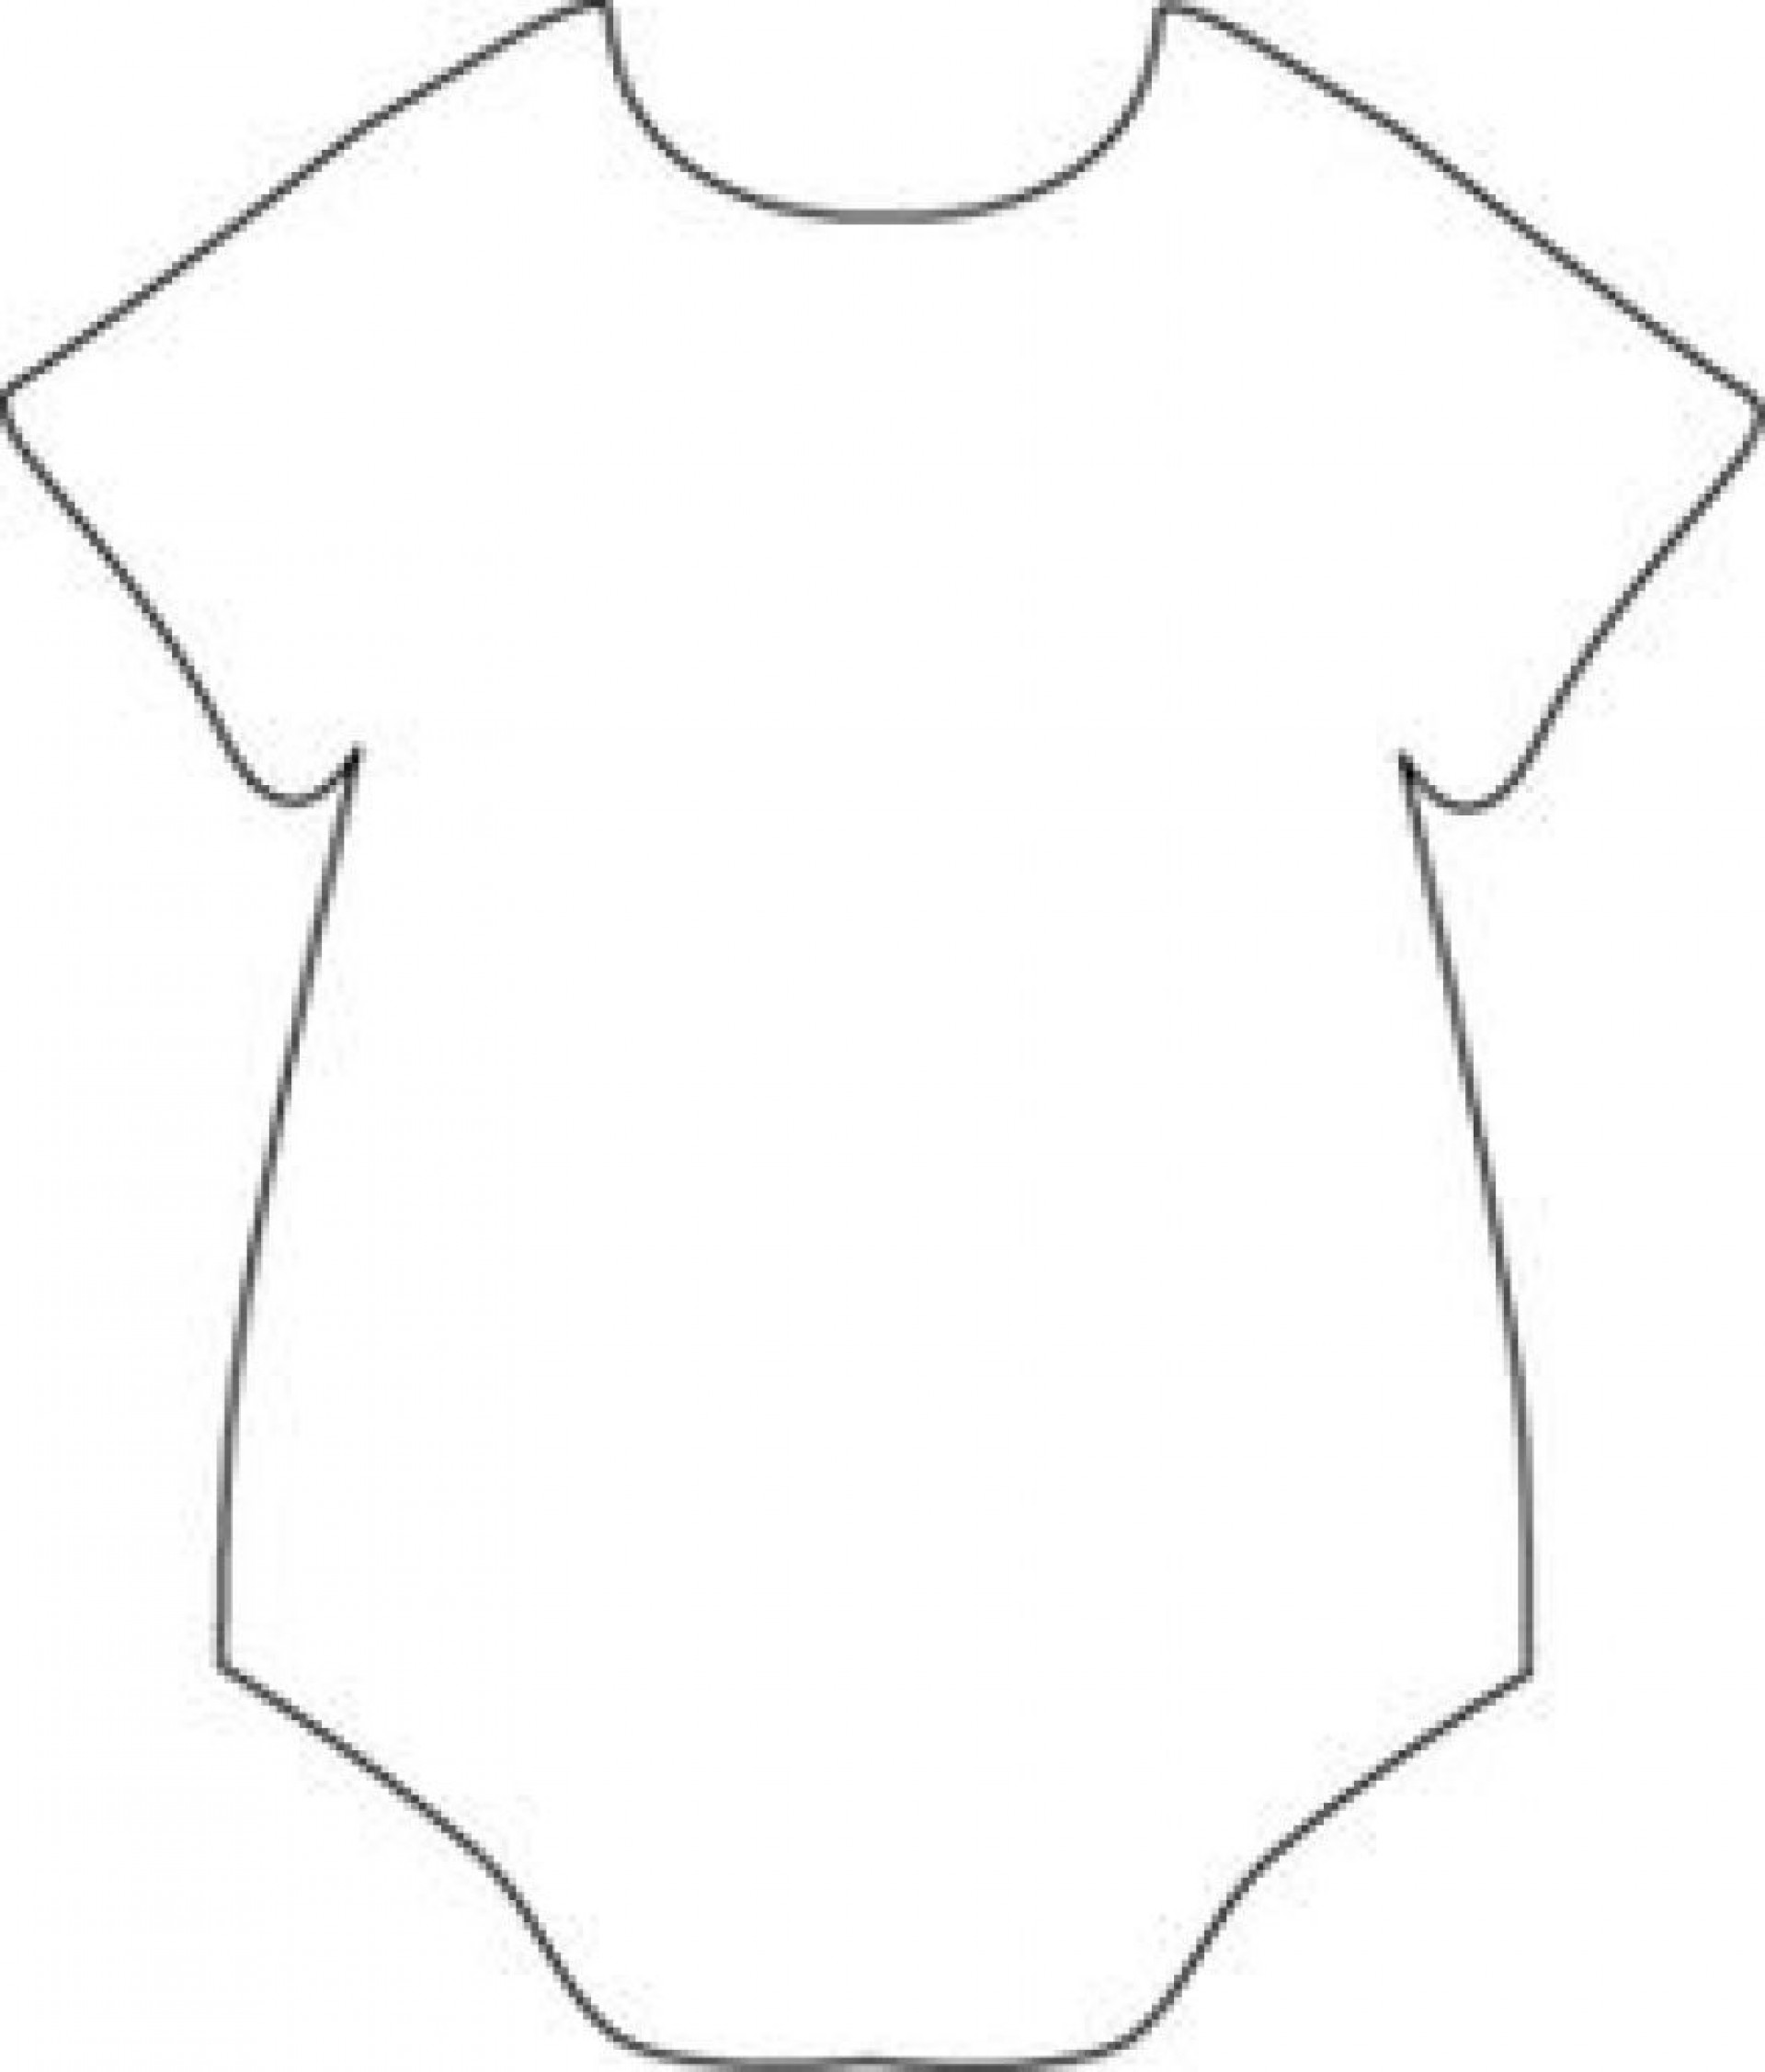 002 Fantastic Onesie Baby Shower Invitation Template High Resolution  Free1920